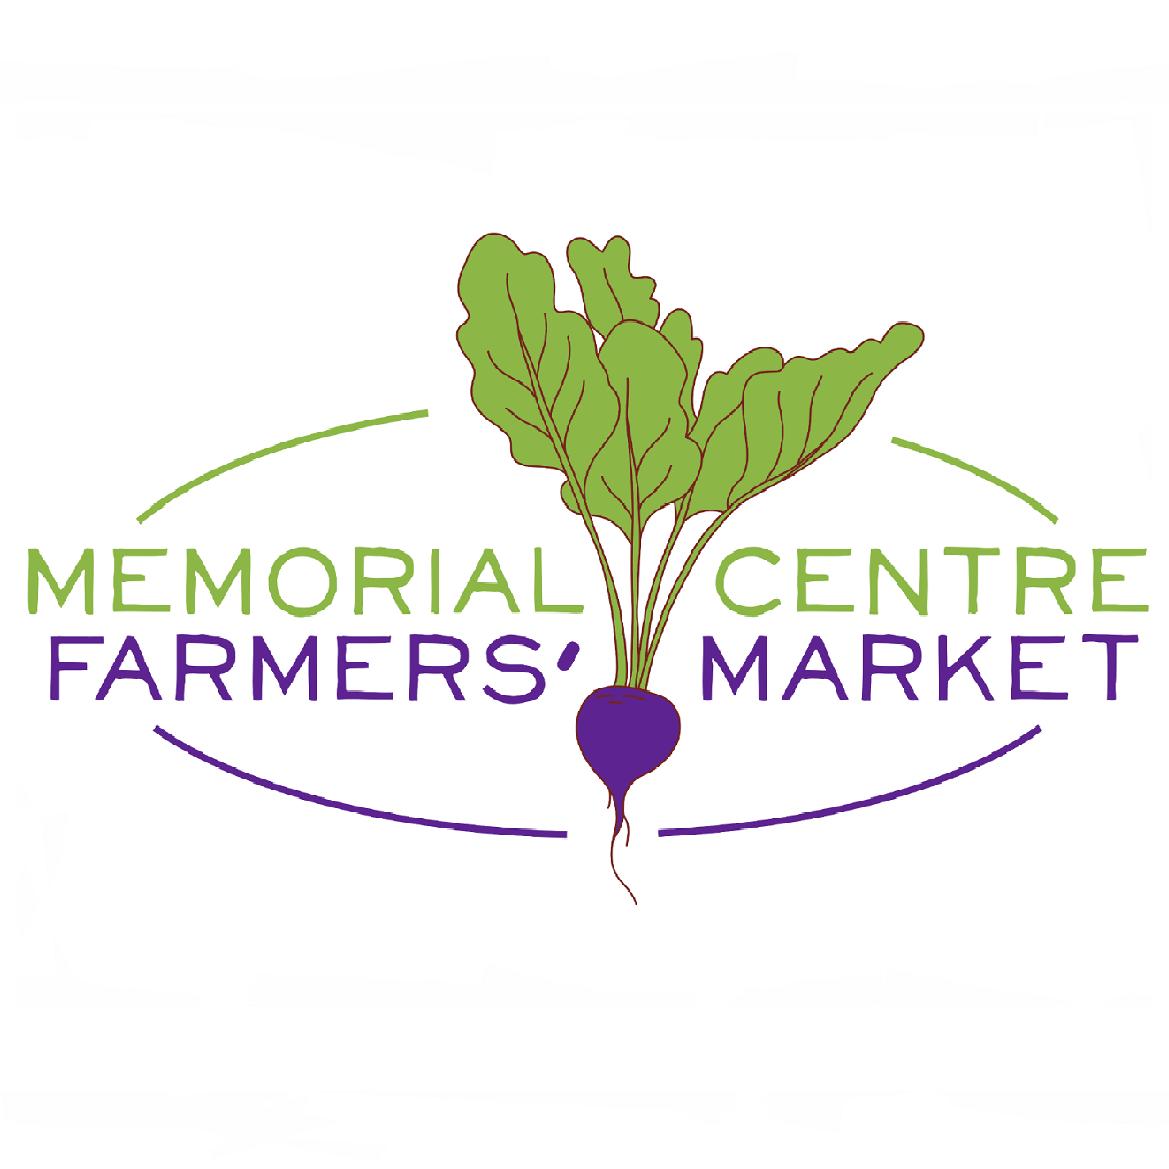 *Memorial Centre Farmers' Market*